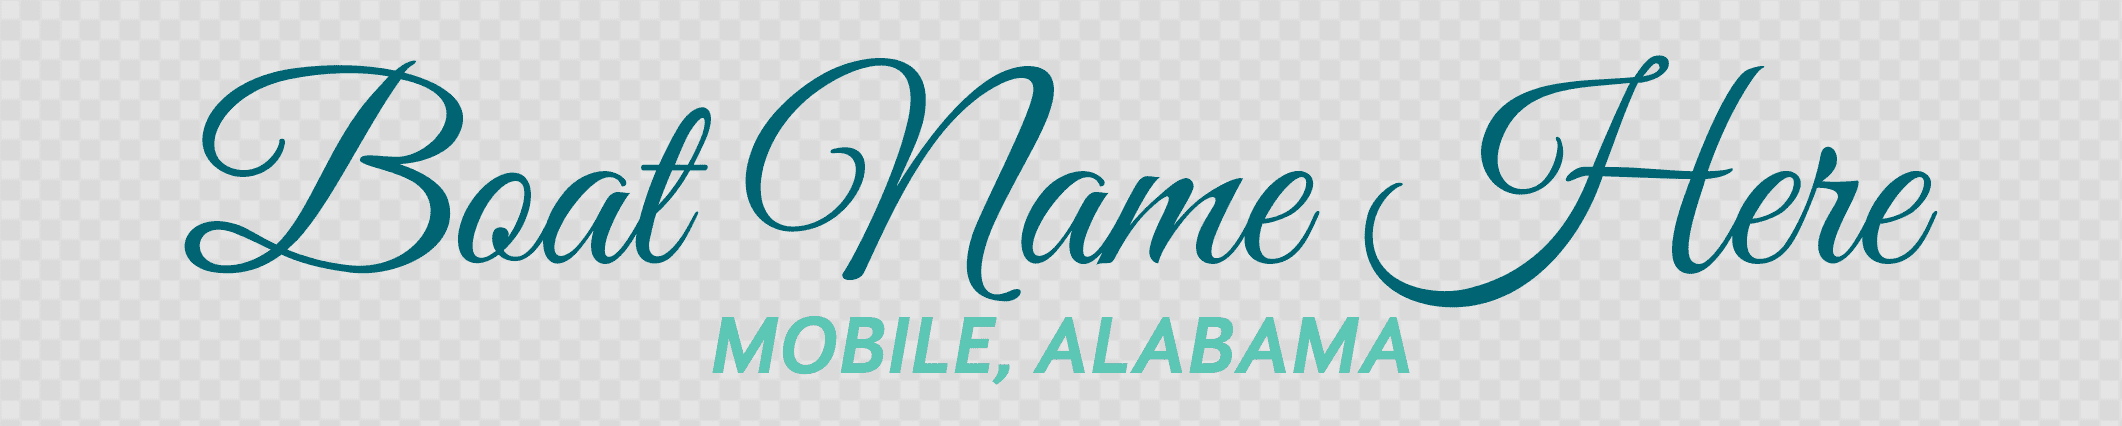 Alabama hailing port template